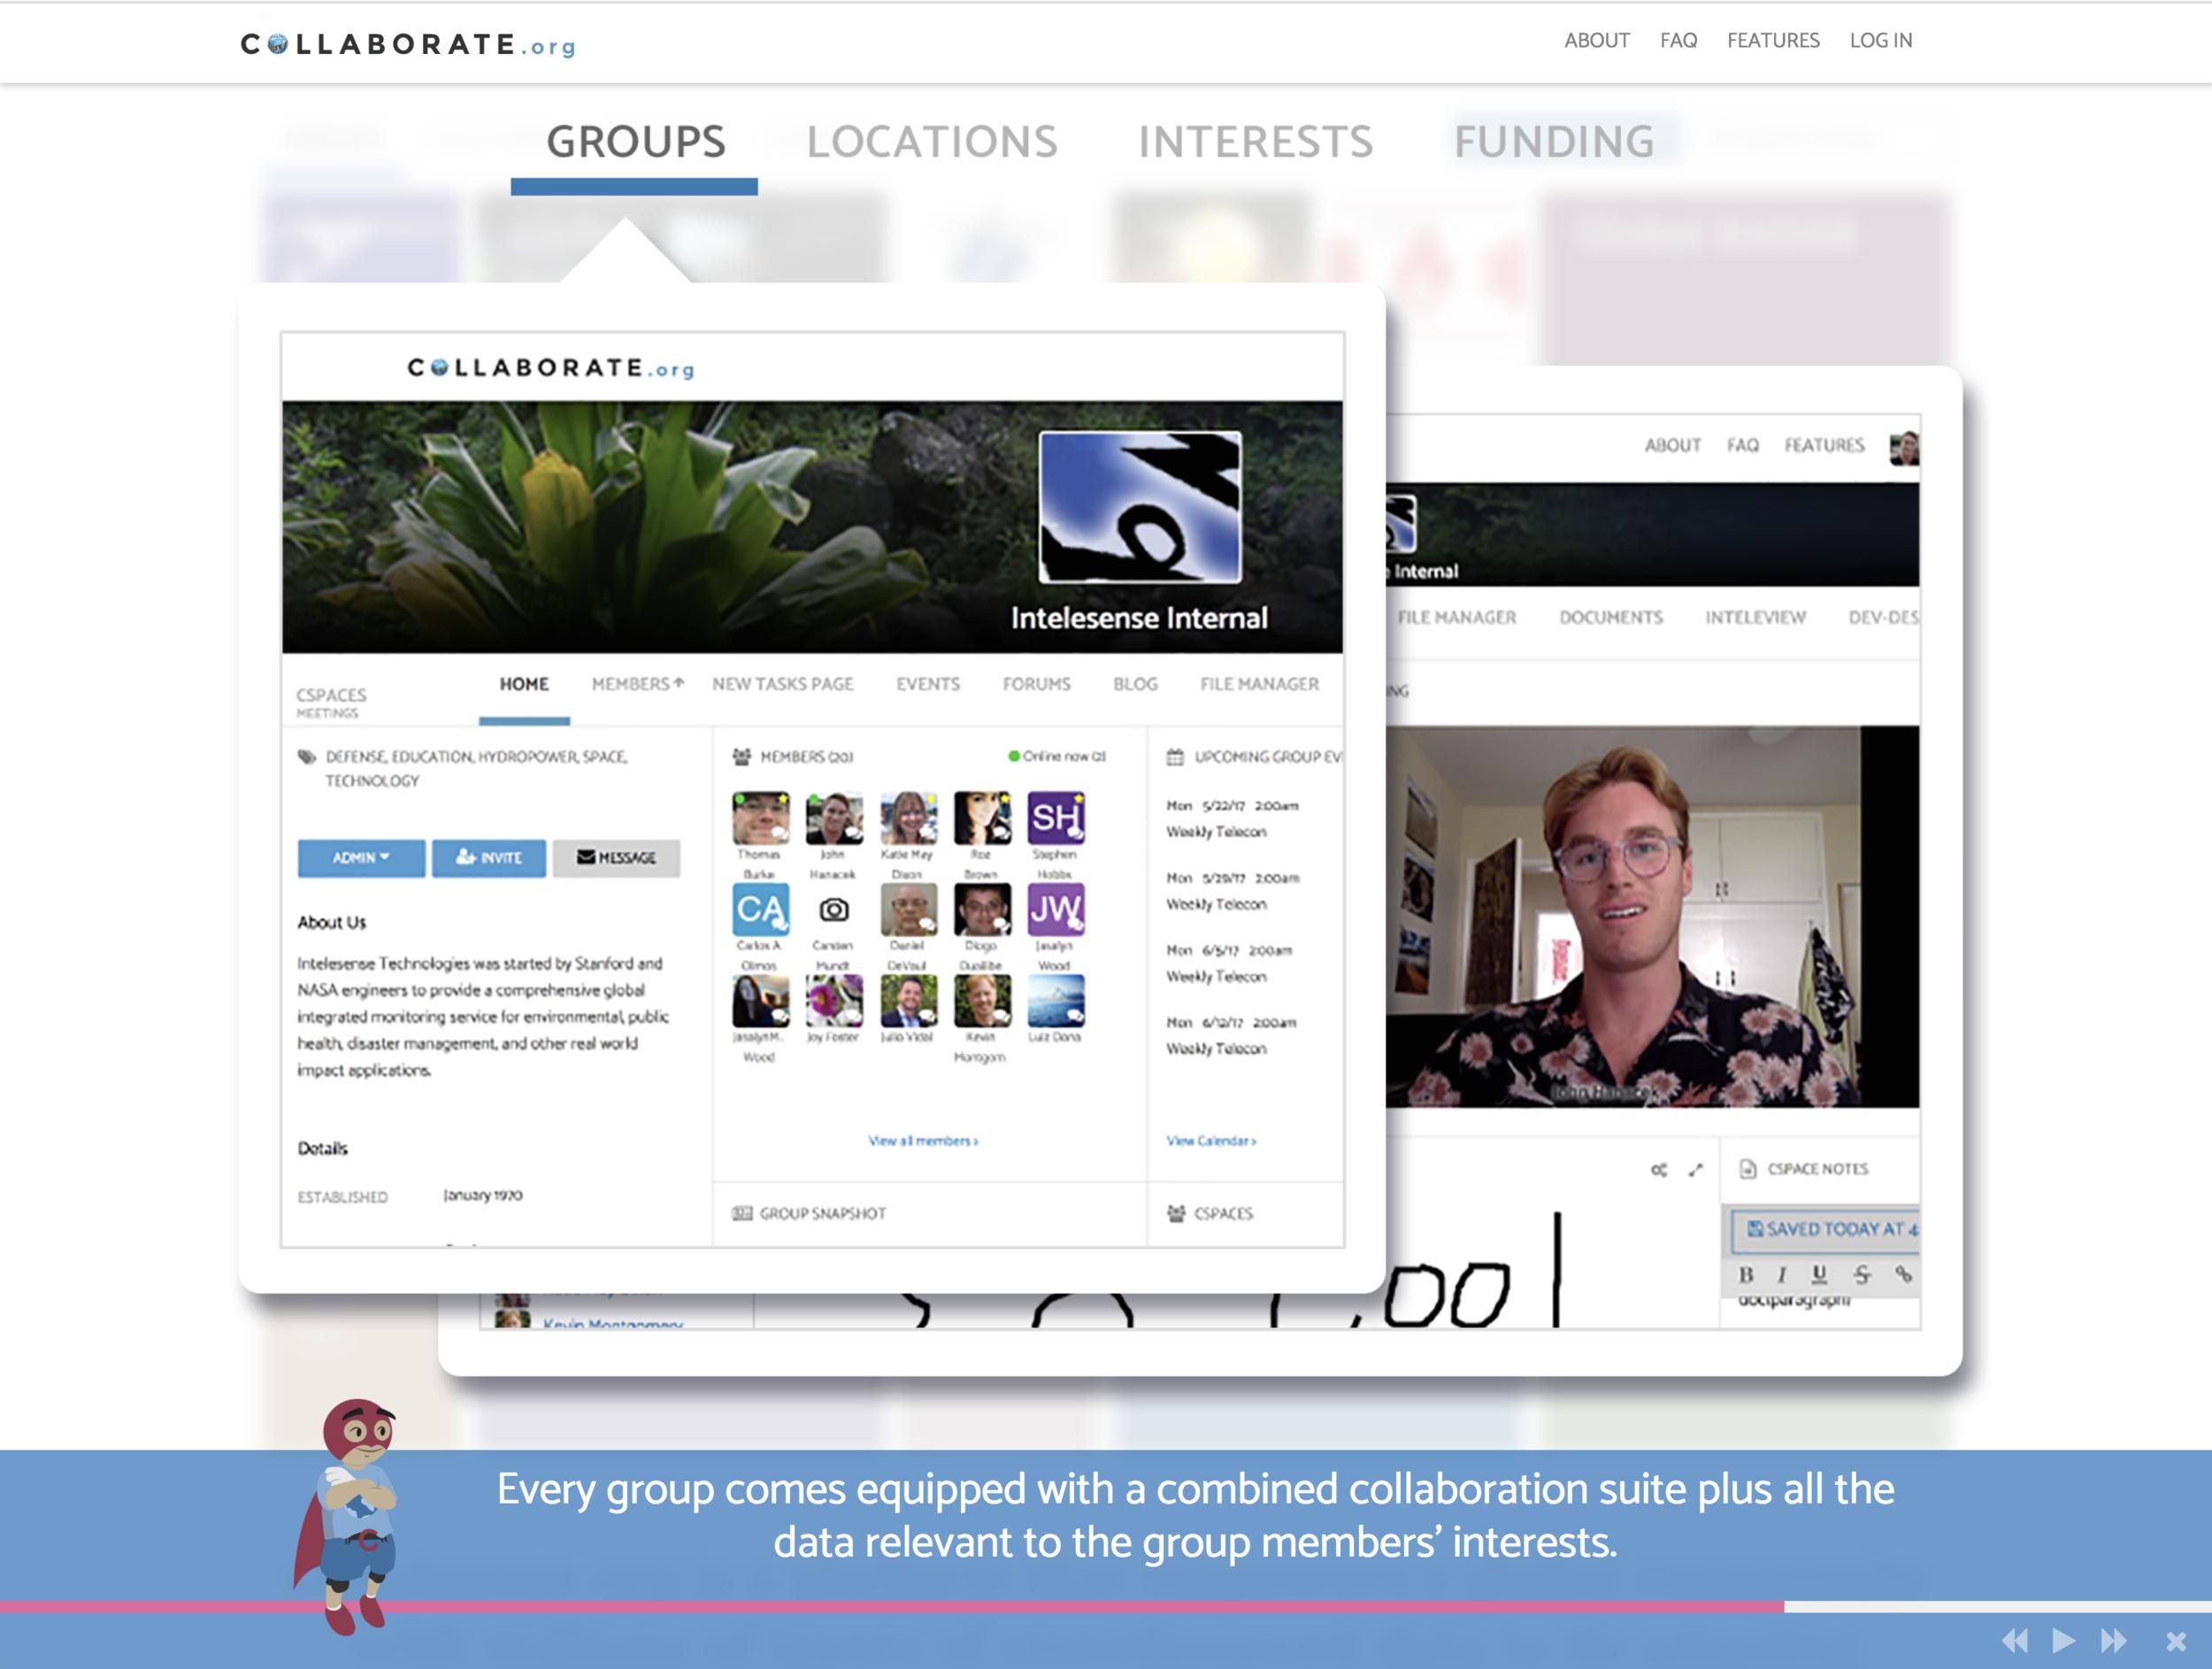 Cspaces concept and group structure lead conceptual designer.